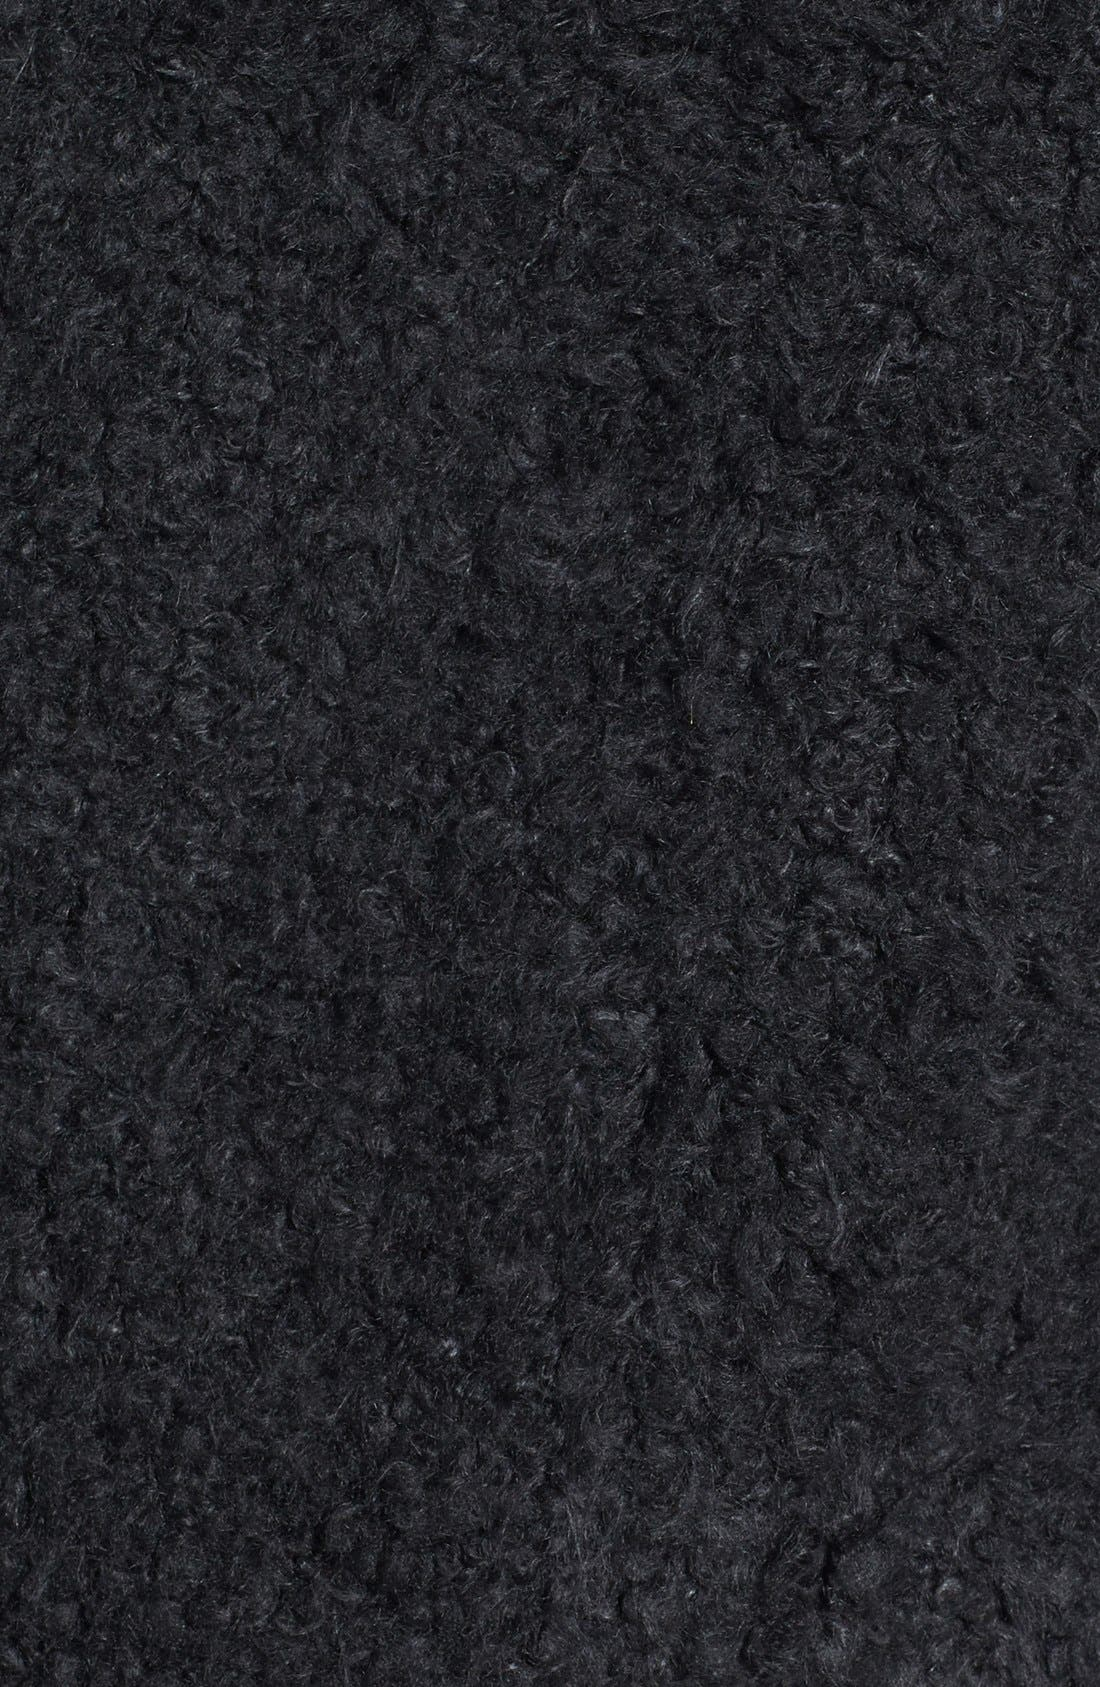 'Teddy' Faux Fur Peacoat,                             Alternate thumbnail 2, color,                             001